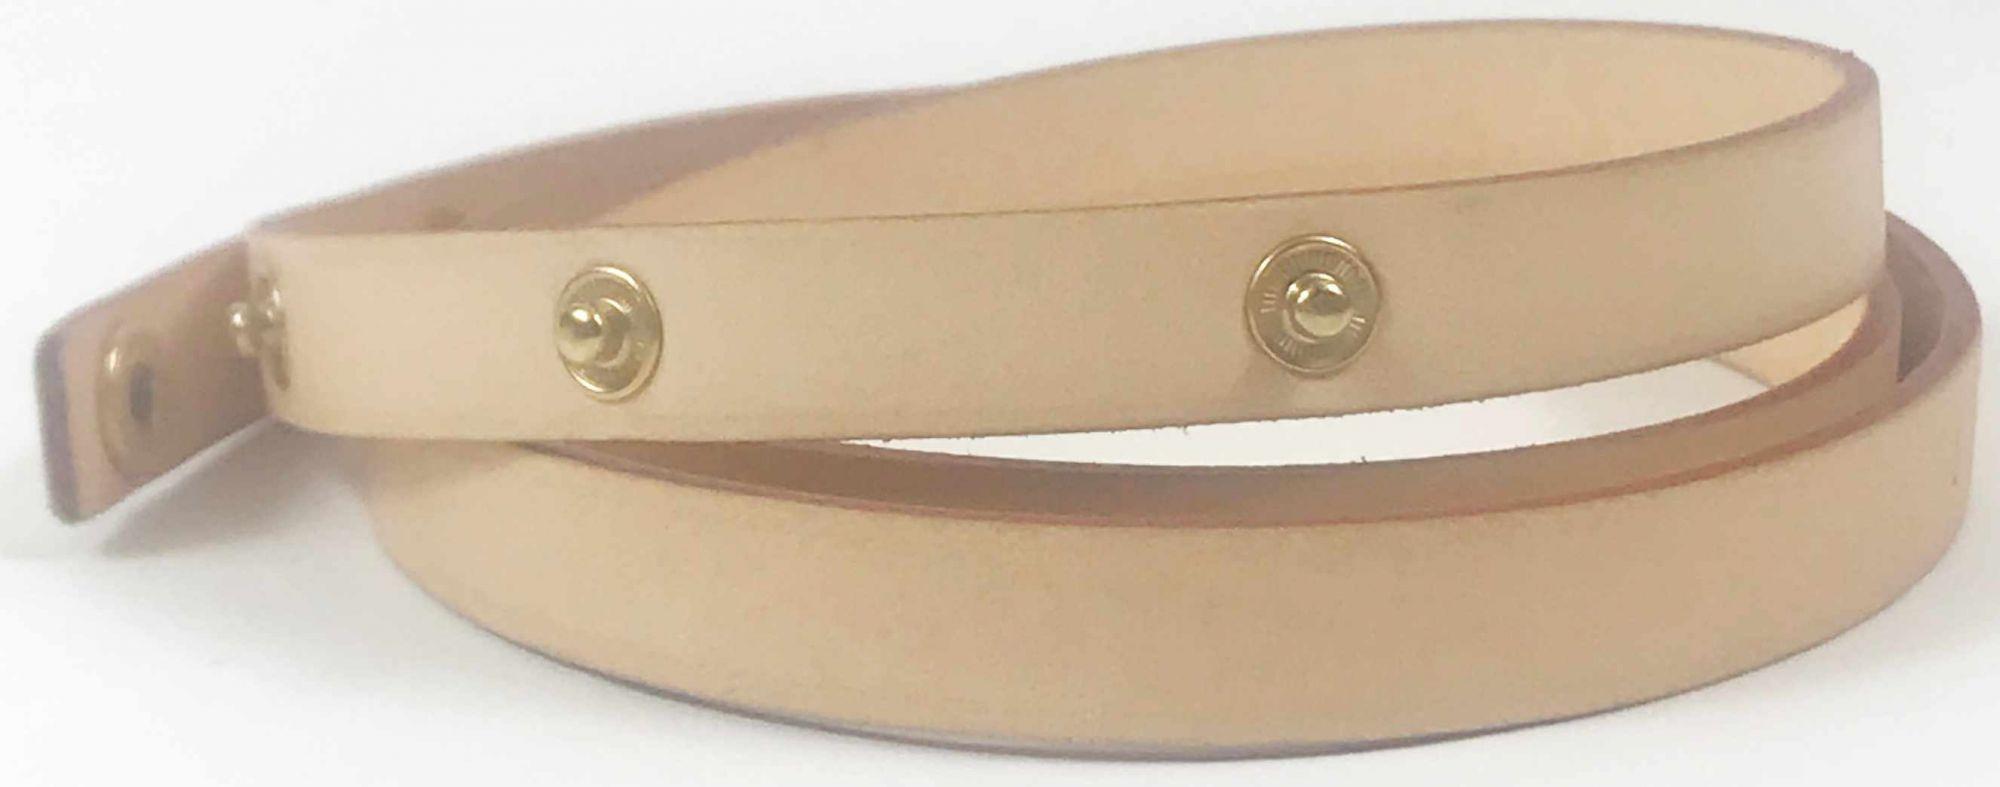 Leather Embossed Florentine Waist Belt/Strap Size : S